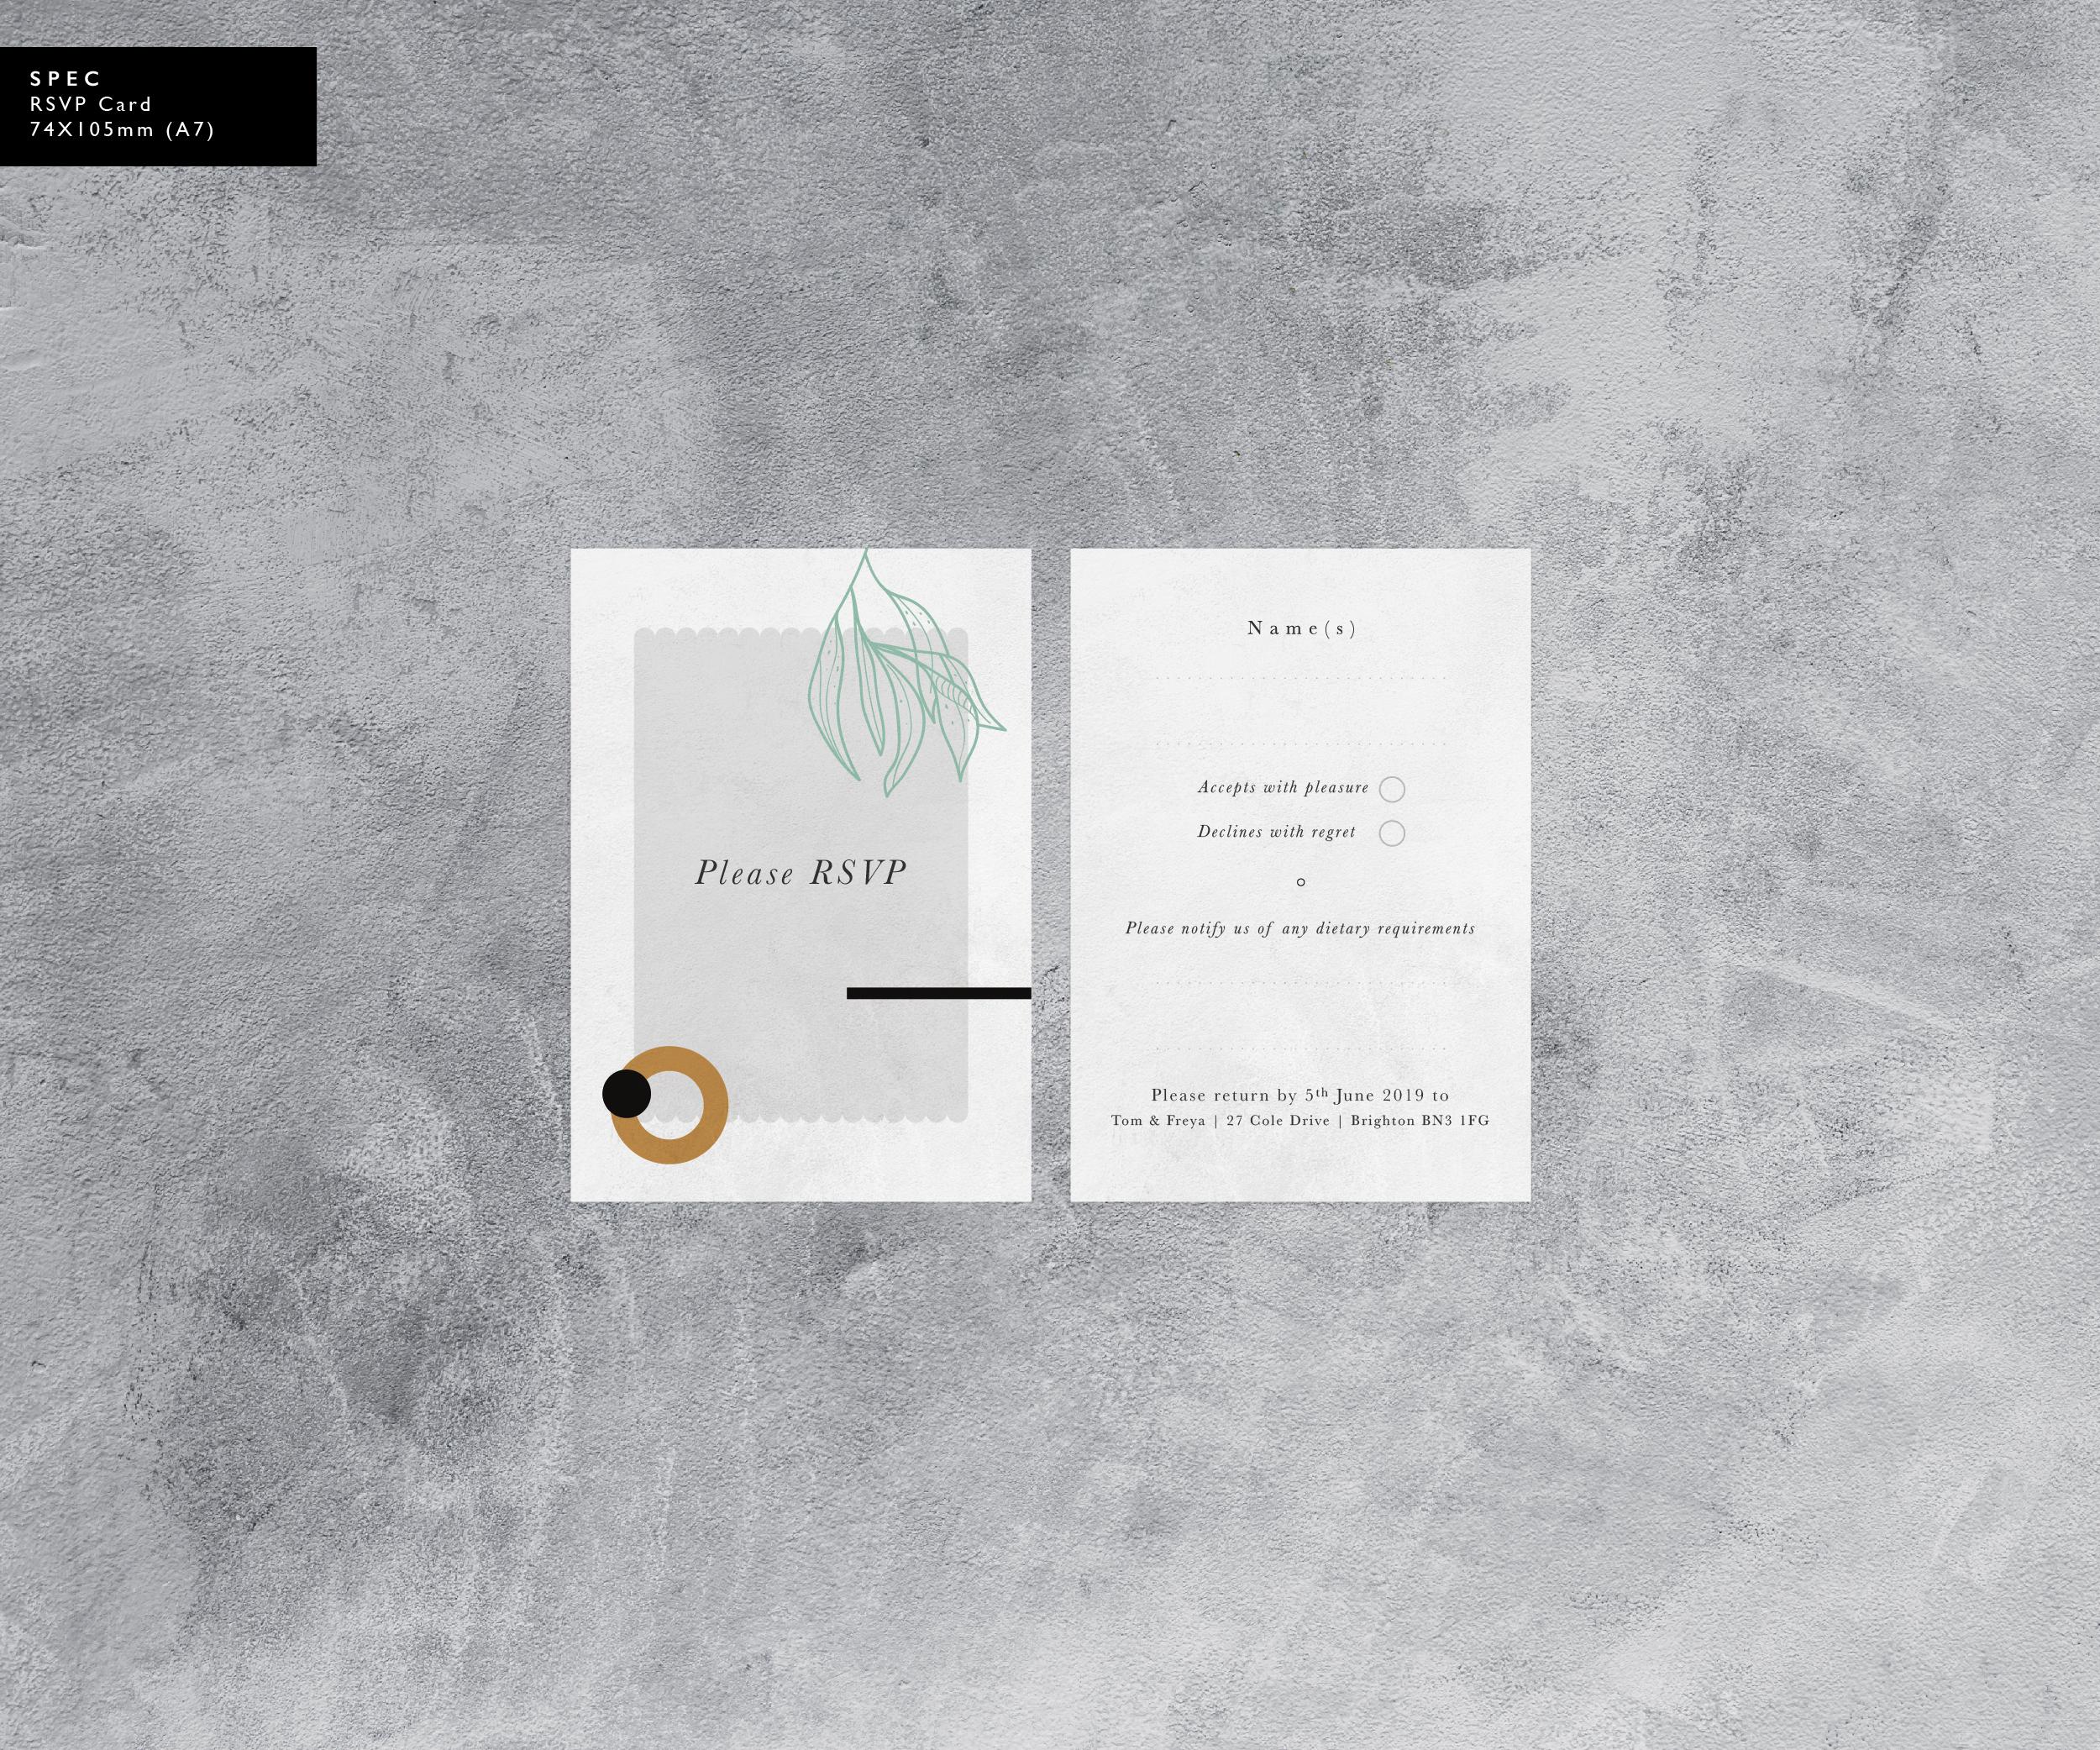 Freya_Wedding_Invitation_Template_11-02-03.jpg